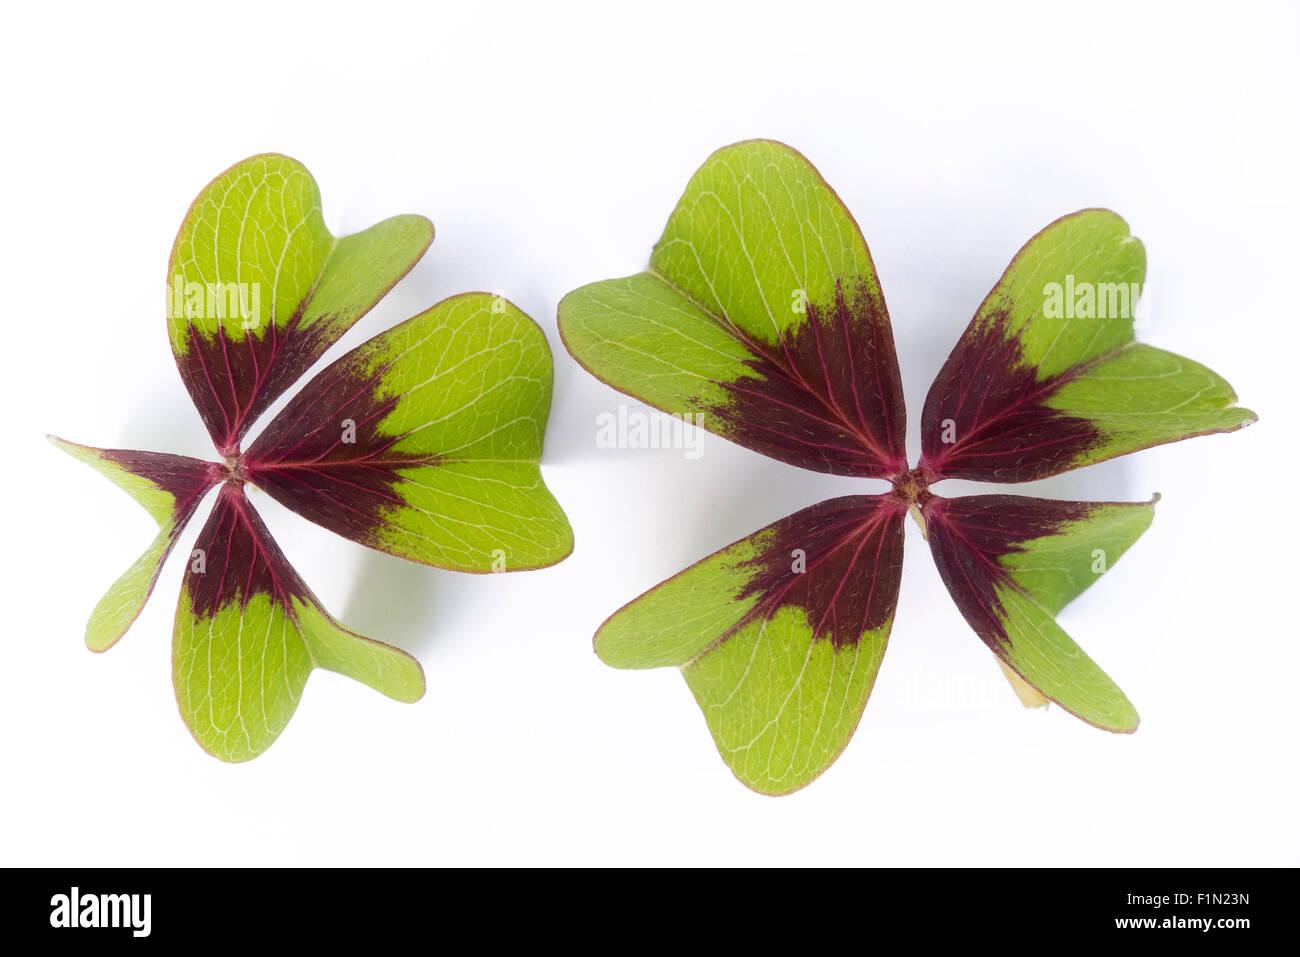 1 x Iron Cross Oxalis Deppei Lucky Clover Plant 8cm pot